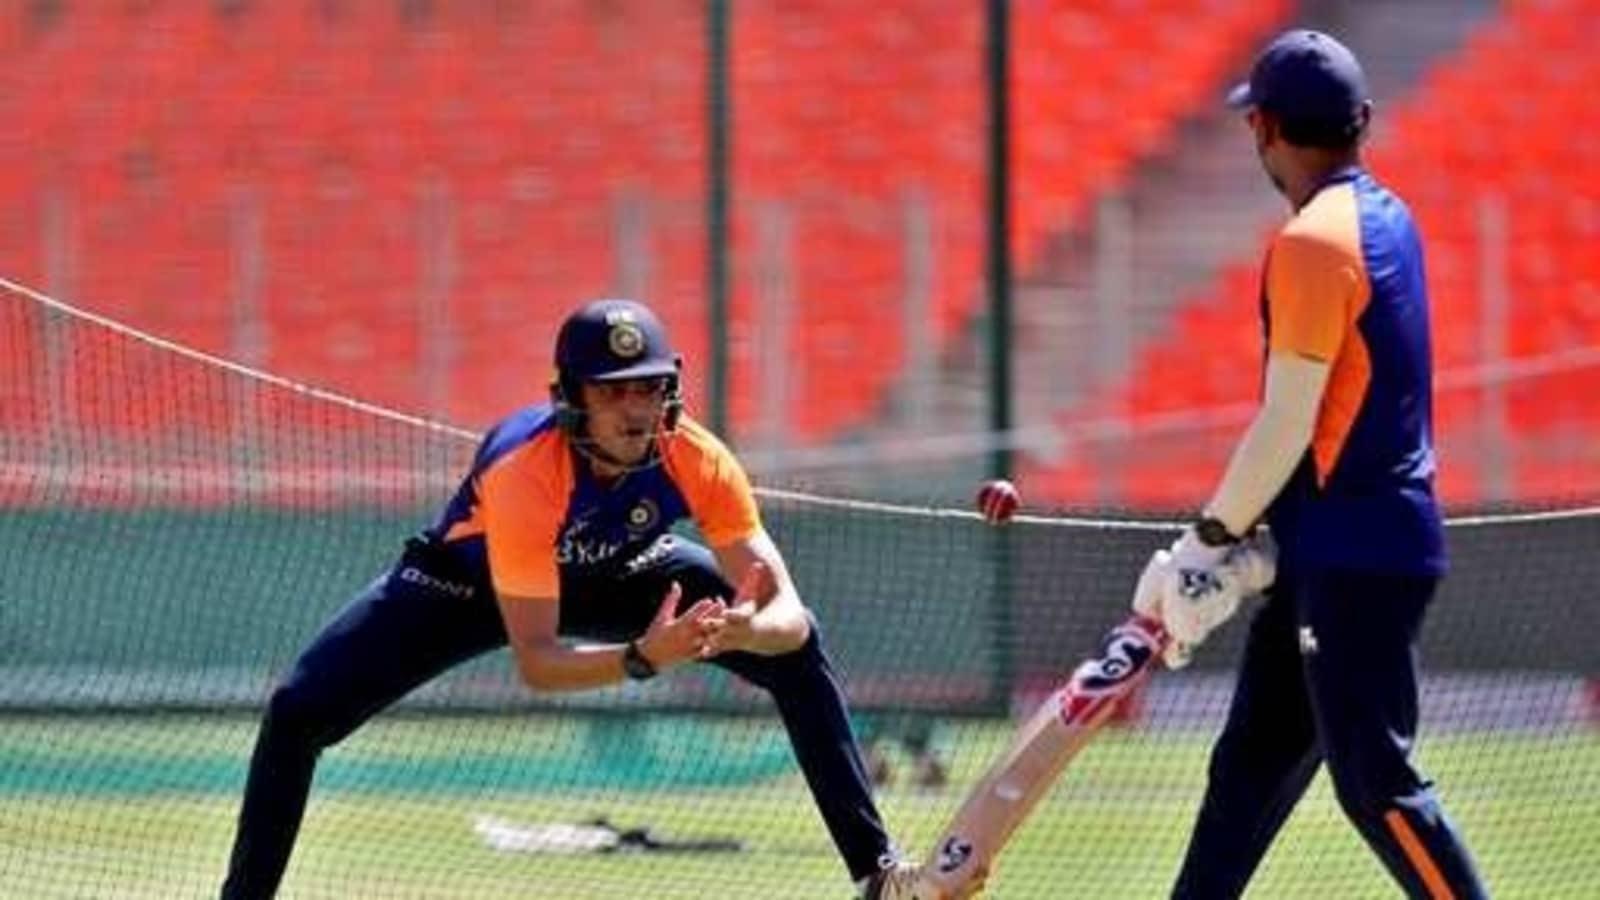 'He will be back scoring runs at the WTC final': Deep Dasgupta backs under-fire India batsman - Hindustan Times